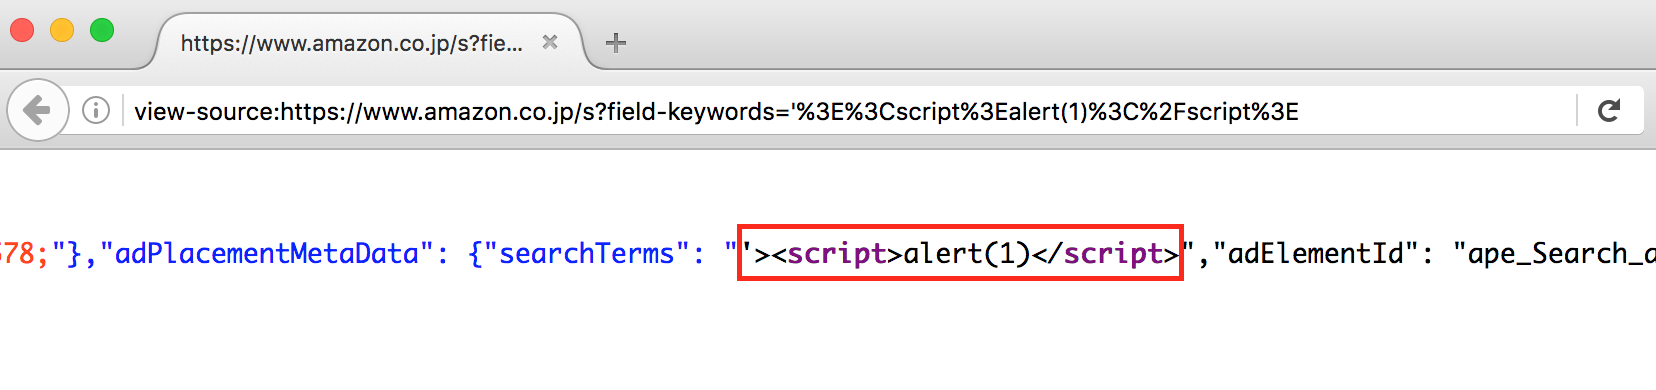 screenshot_html_with_box.png